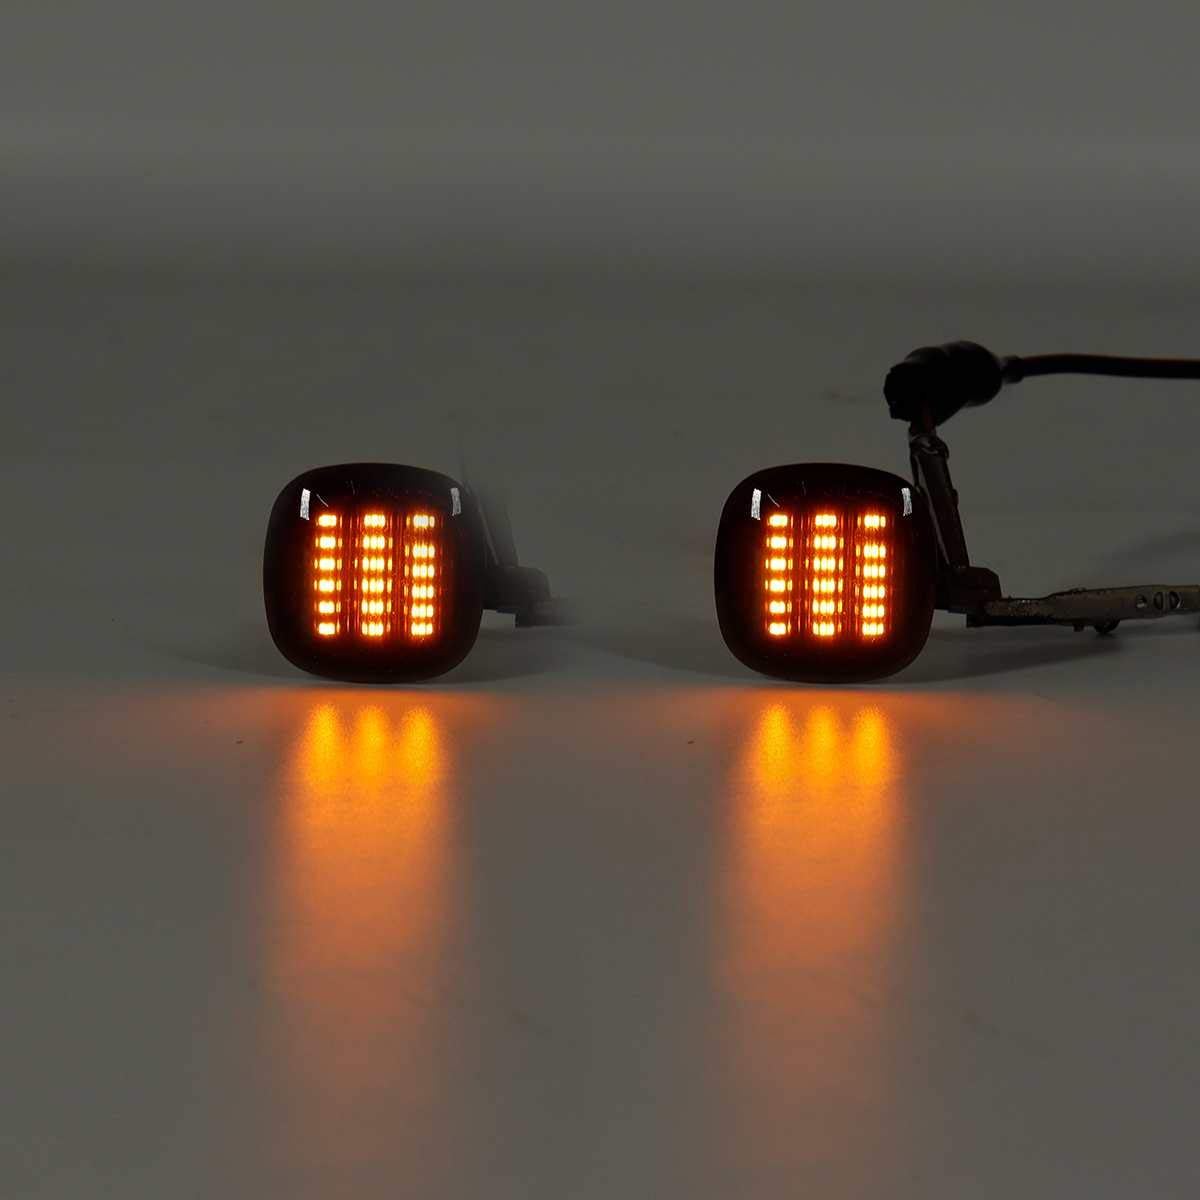 Shumo 2Pcs LED Side Marker Wing Repeater Indicators Light Dynamic Side Marker Light Turn Signal Light LED Lamps for SKODA Fabia SEAT Cordoba For A3 8L A4 8D A4 S4 B5